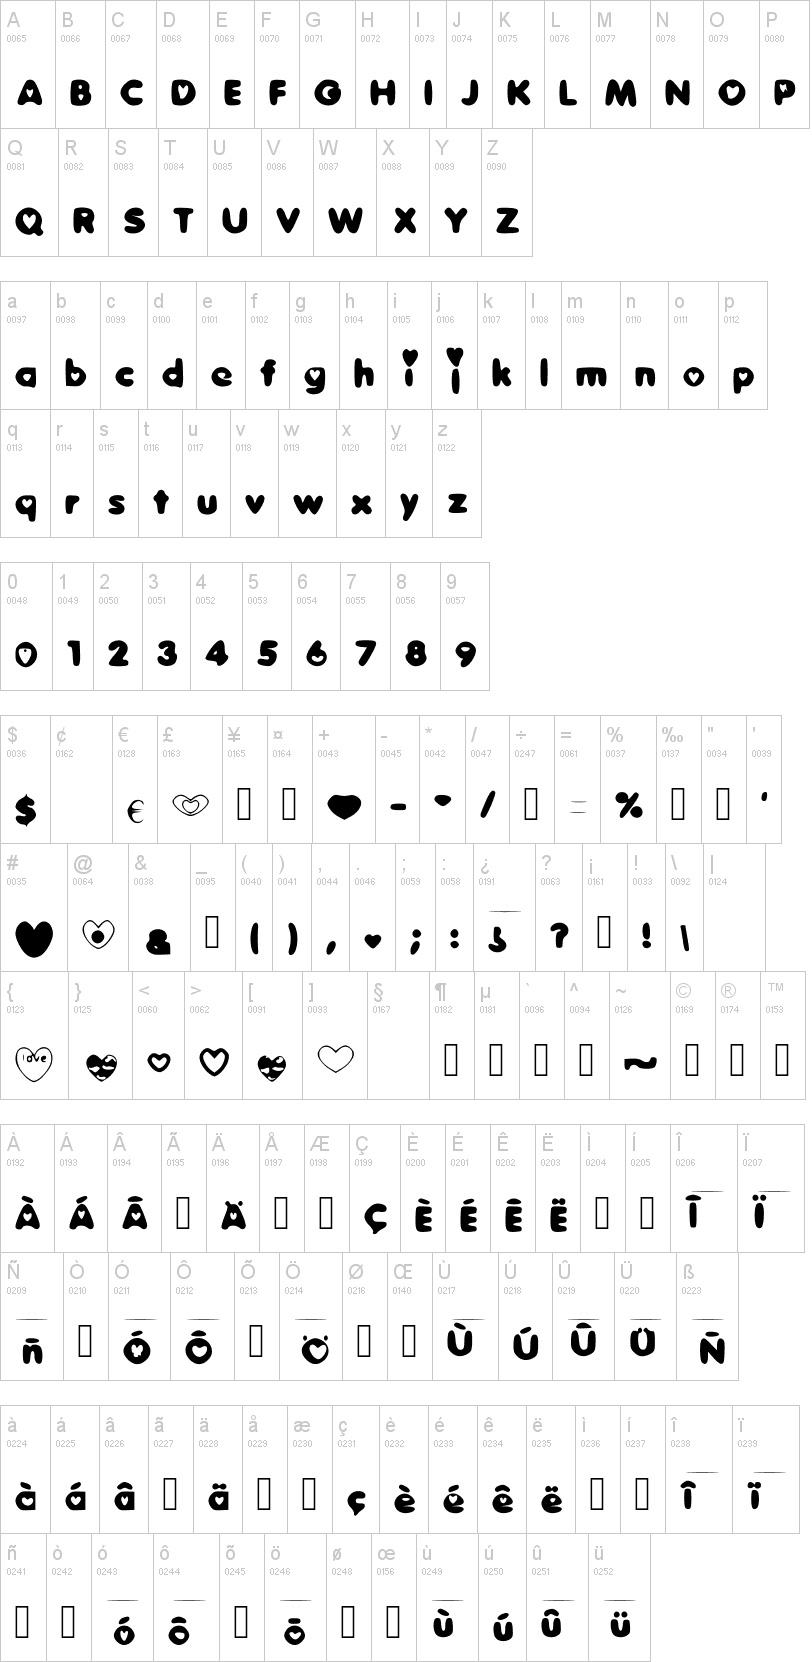 Dulce Amor tipografia abecedario